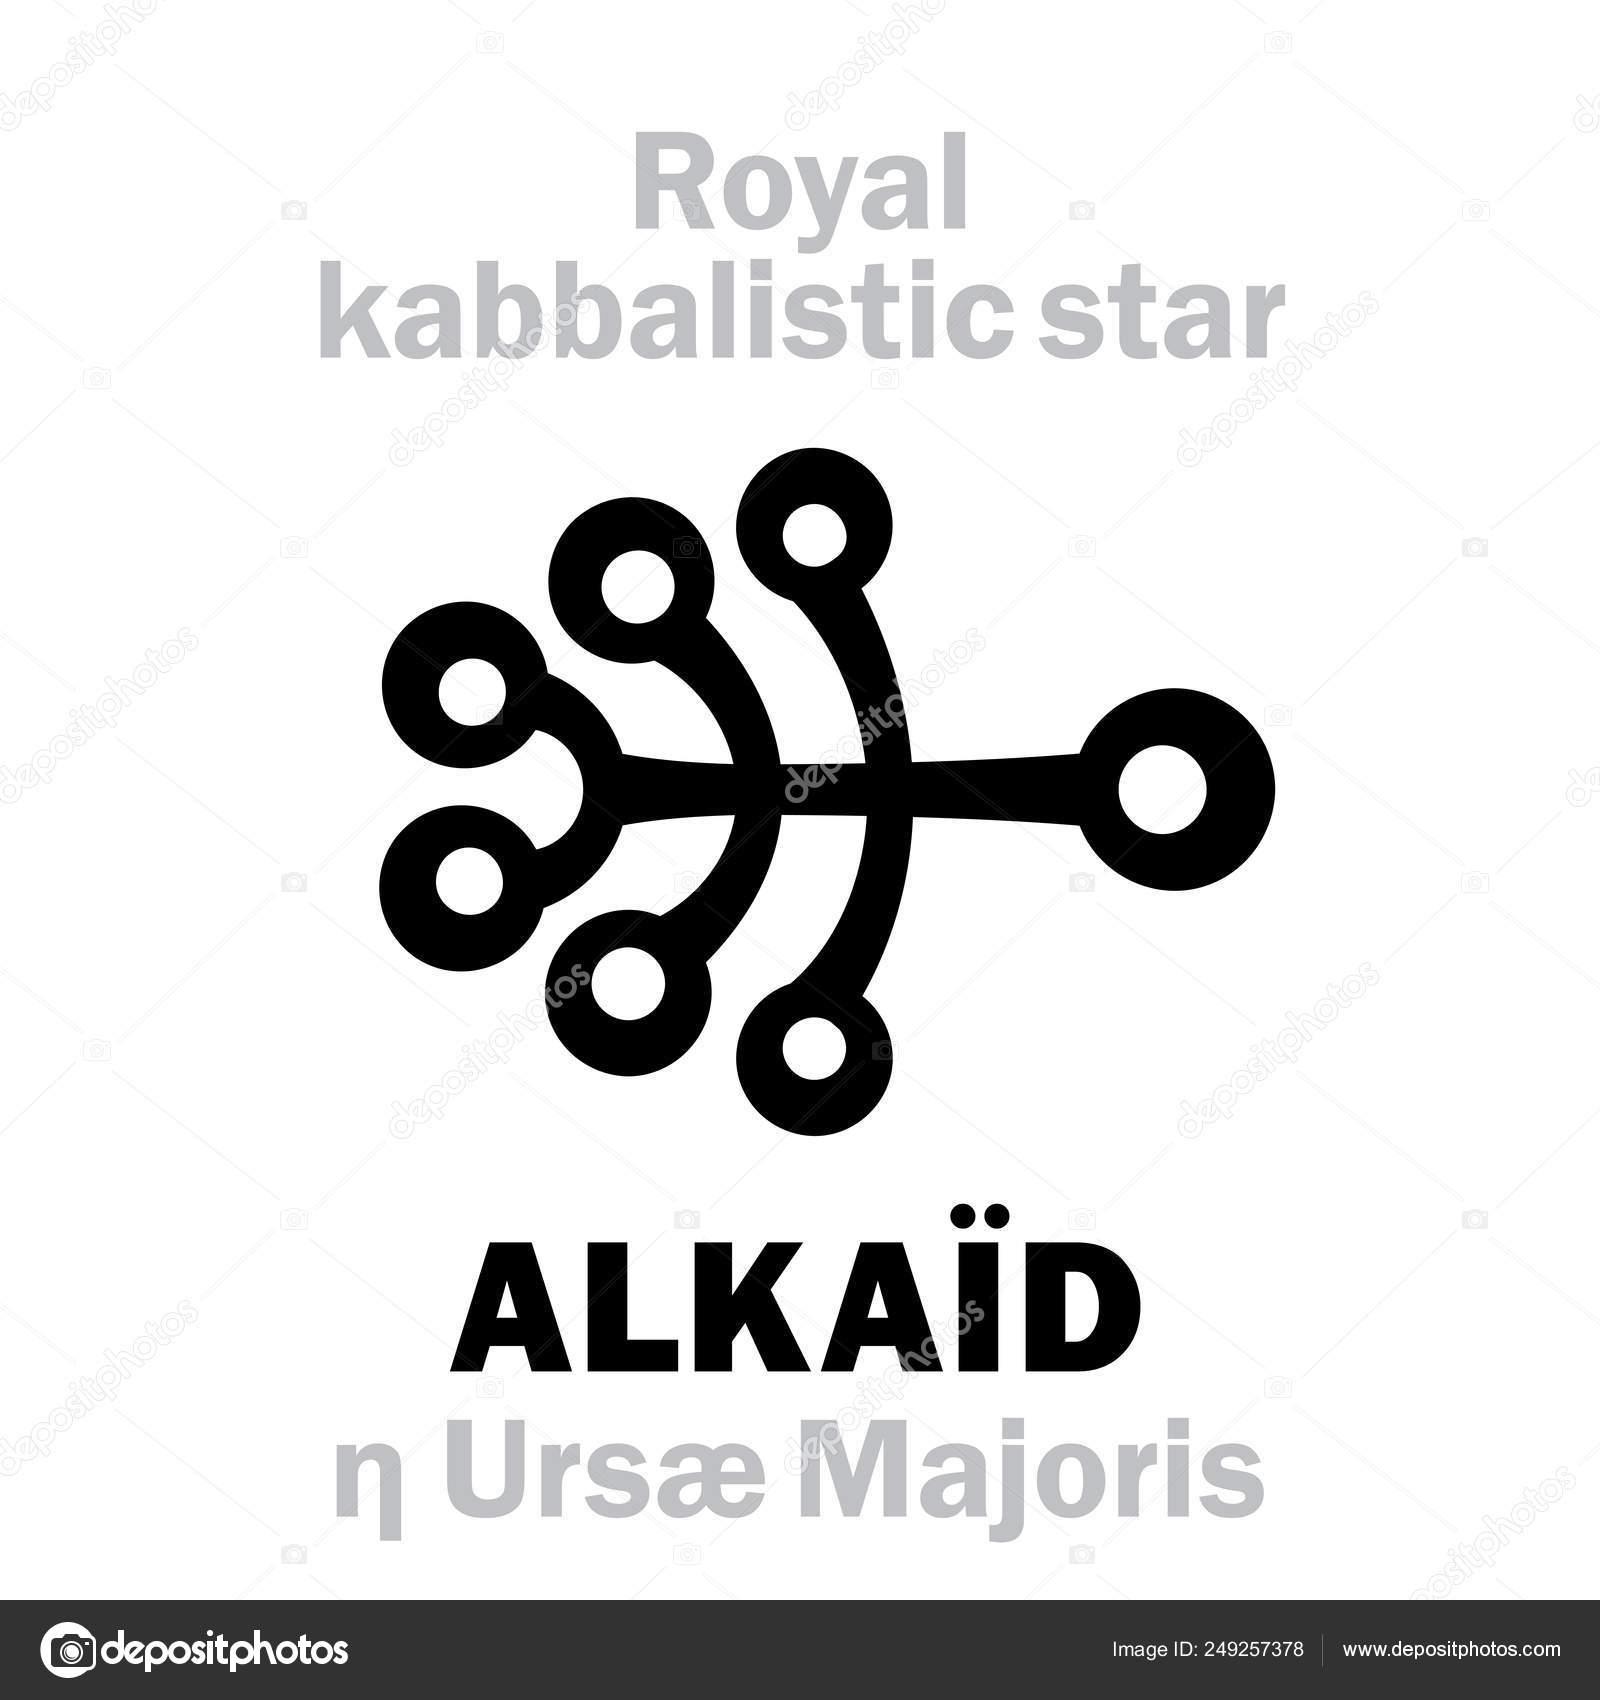 Astrology: ALKAID / BENETNASCH (The Royal Behenian